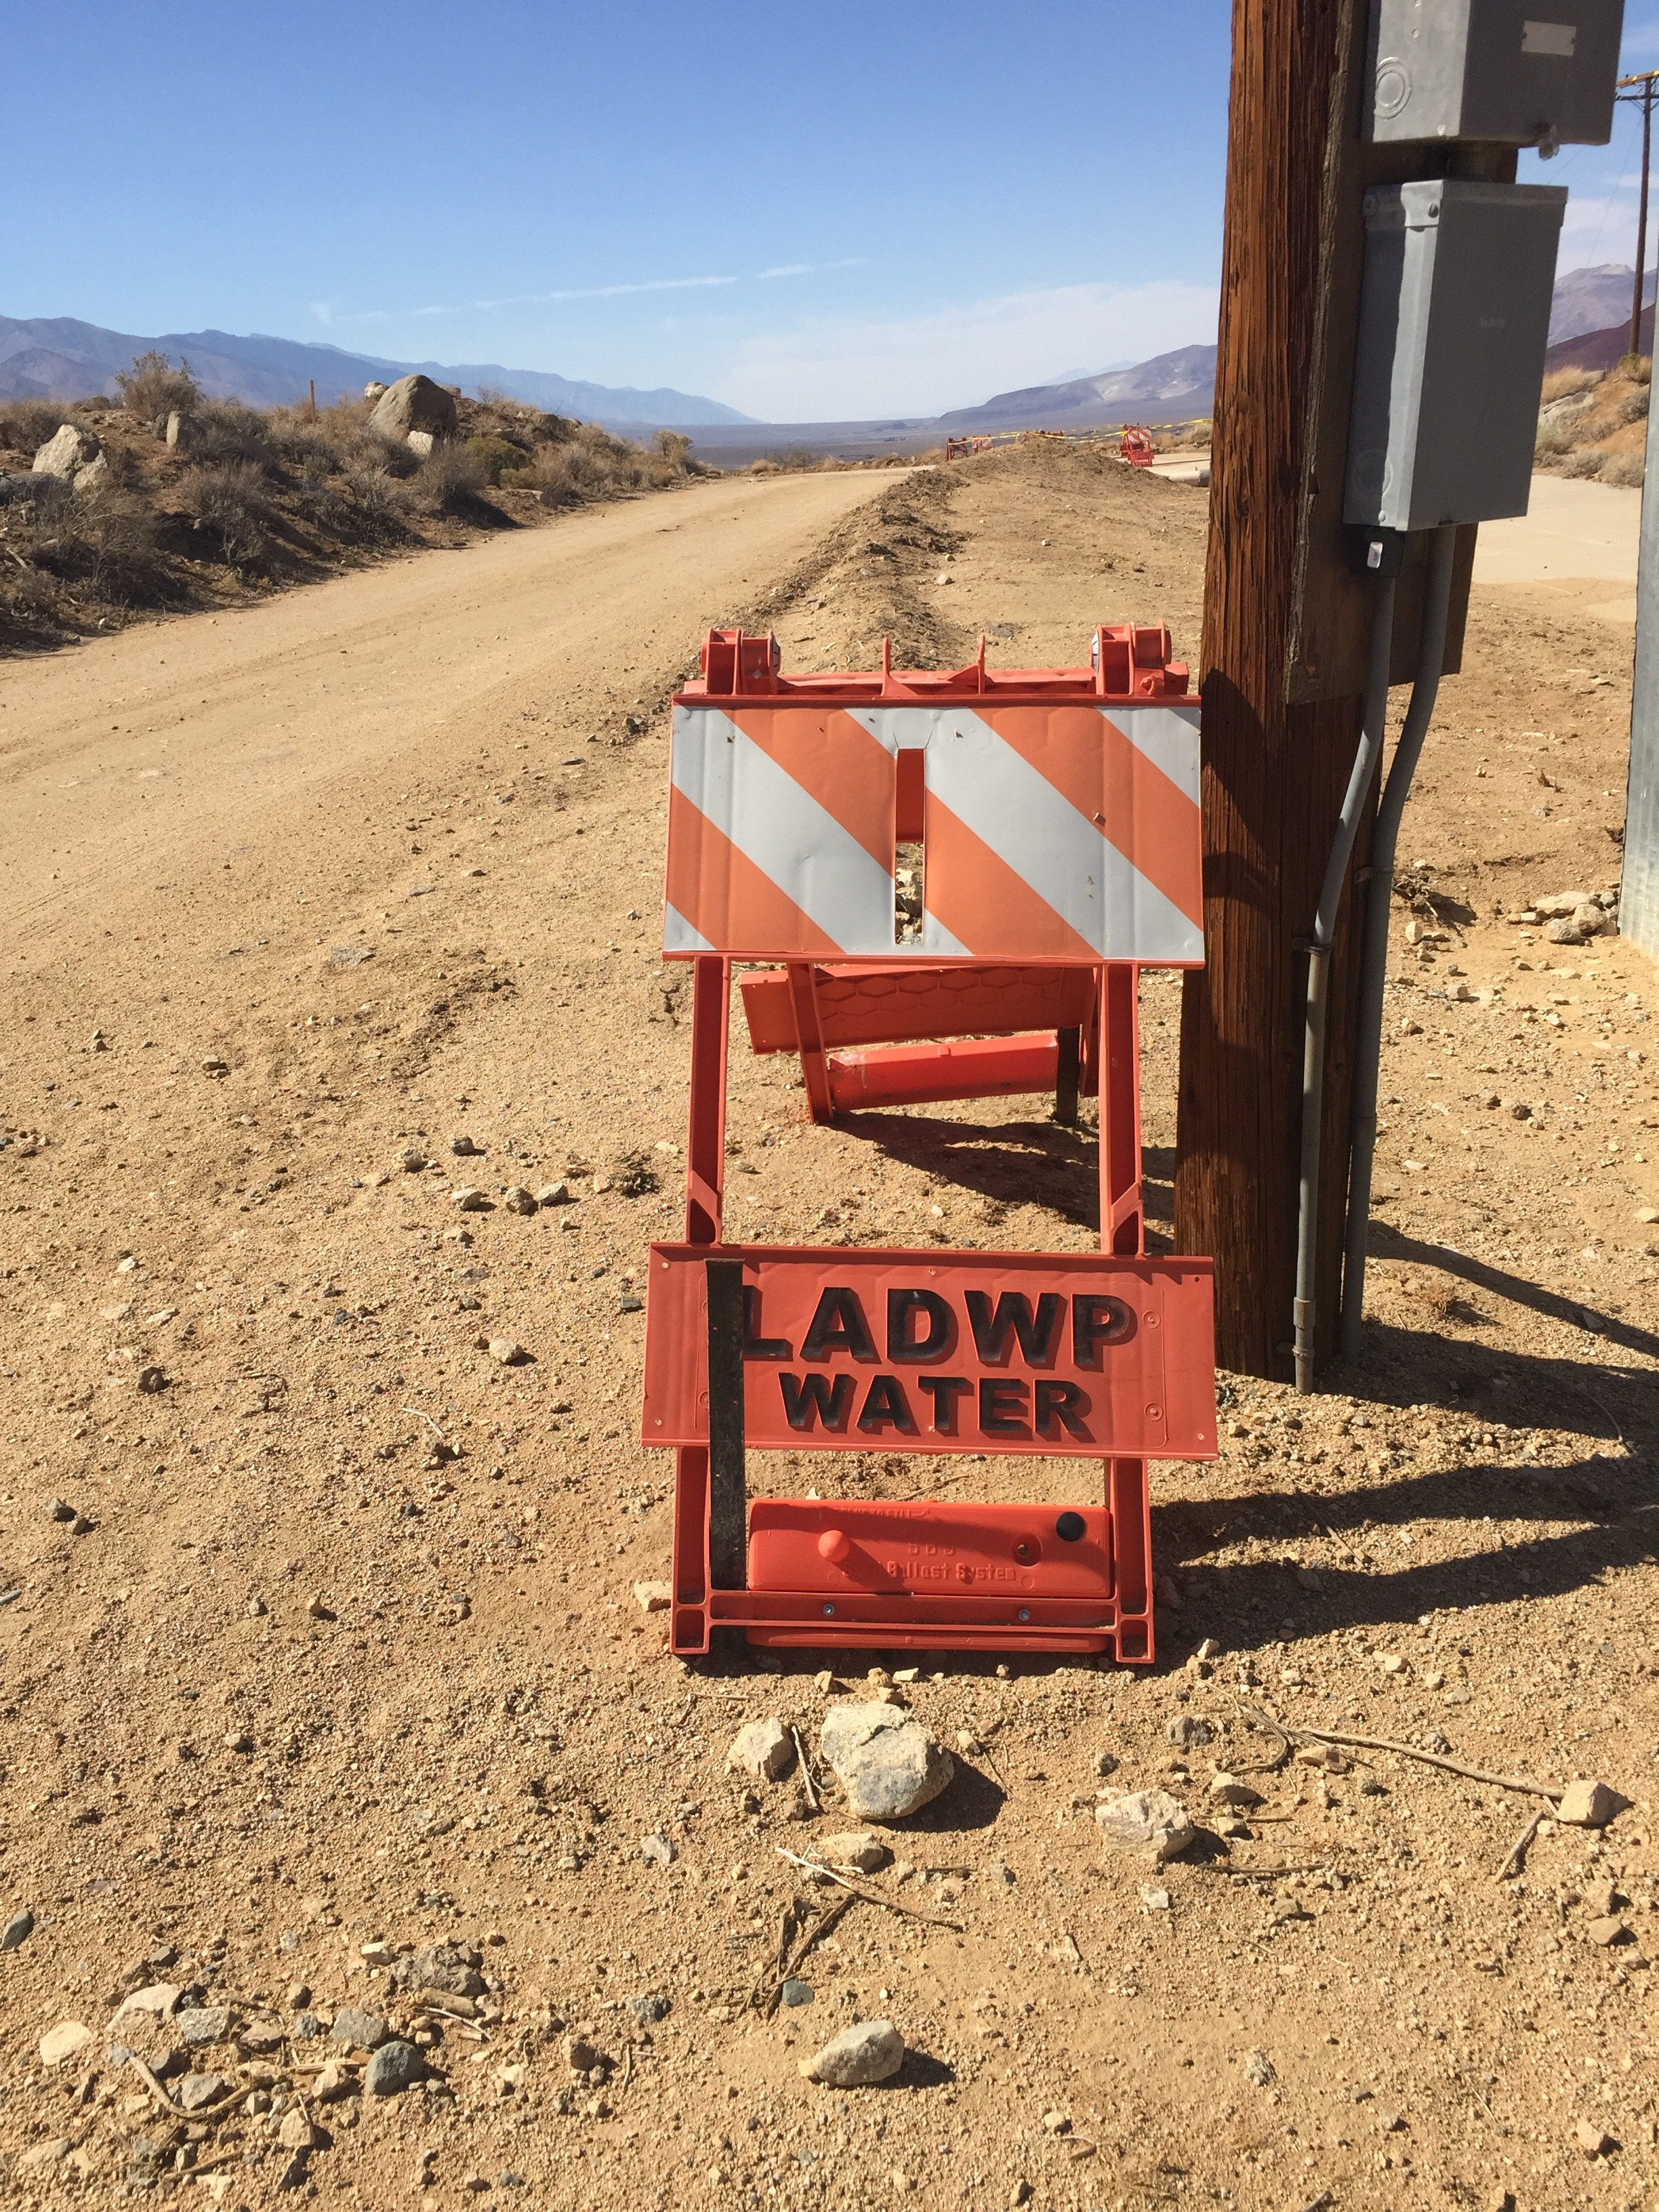 LADWP detritus in the Mojave.